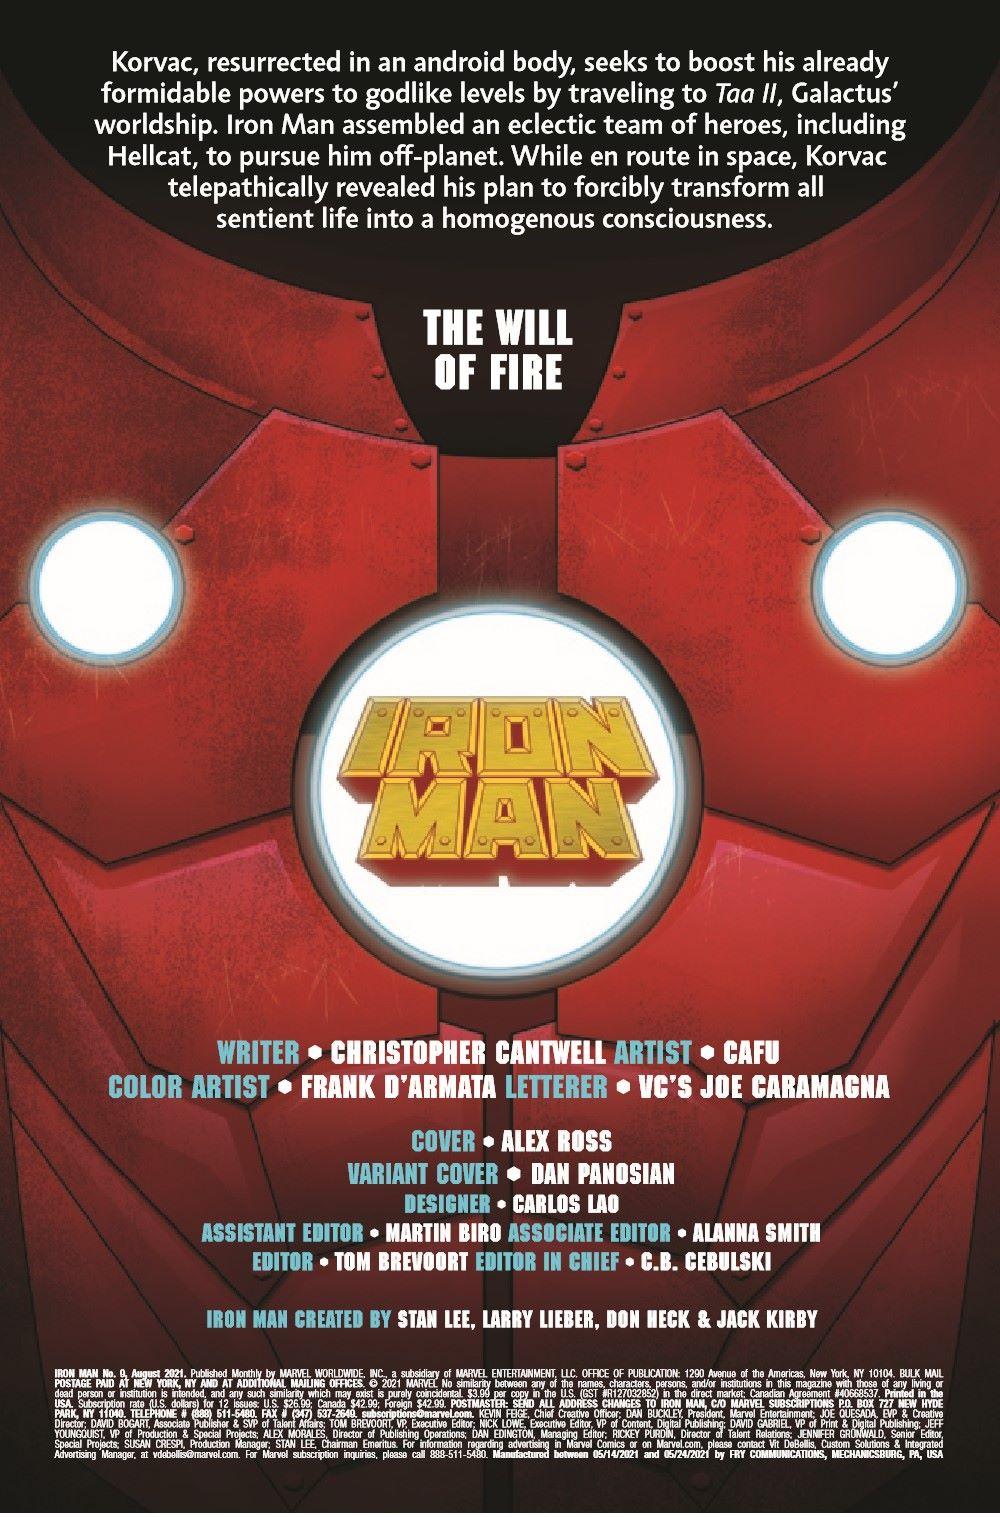 IM2020009_Preview-2 ComicList Previews: IRON MAN #9